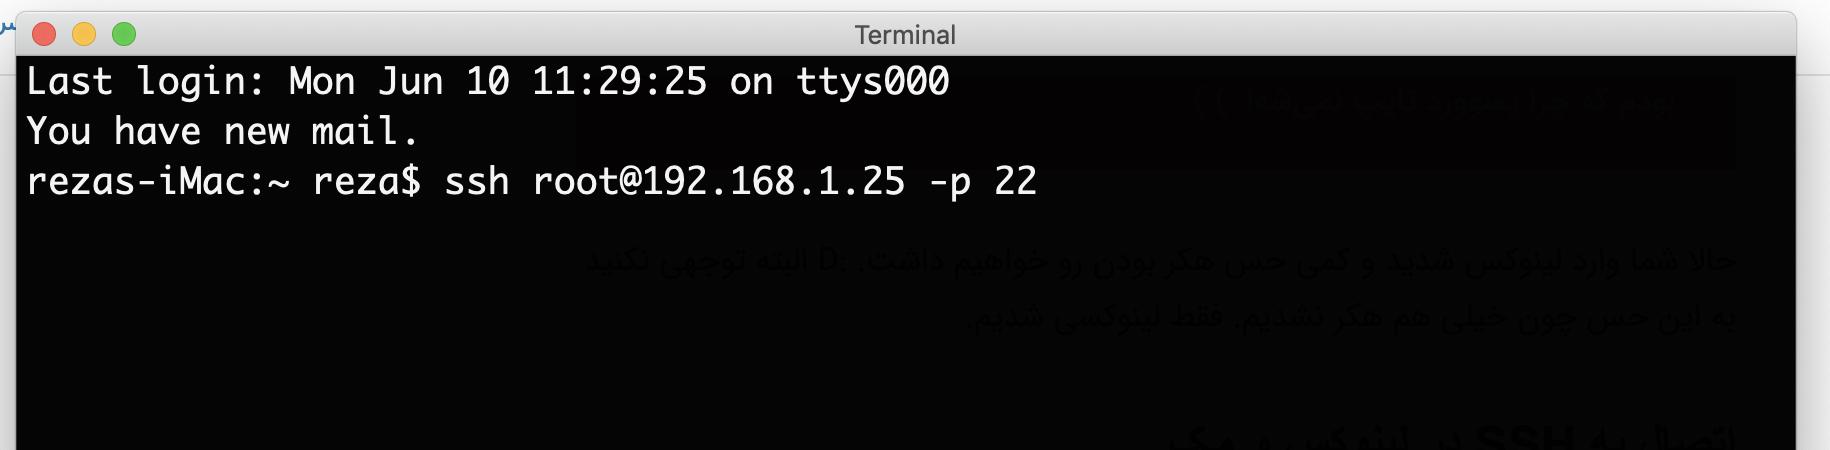 آموزش اتصال به SSH لینوکس